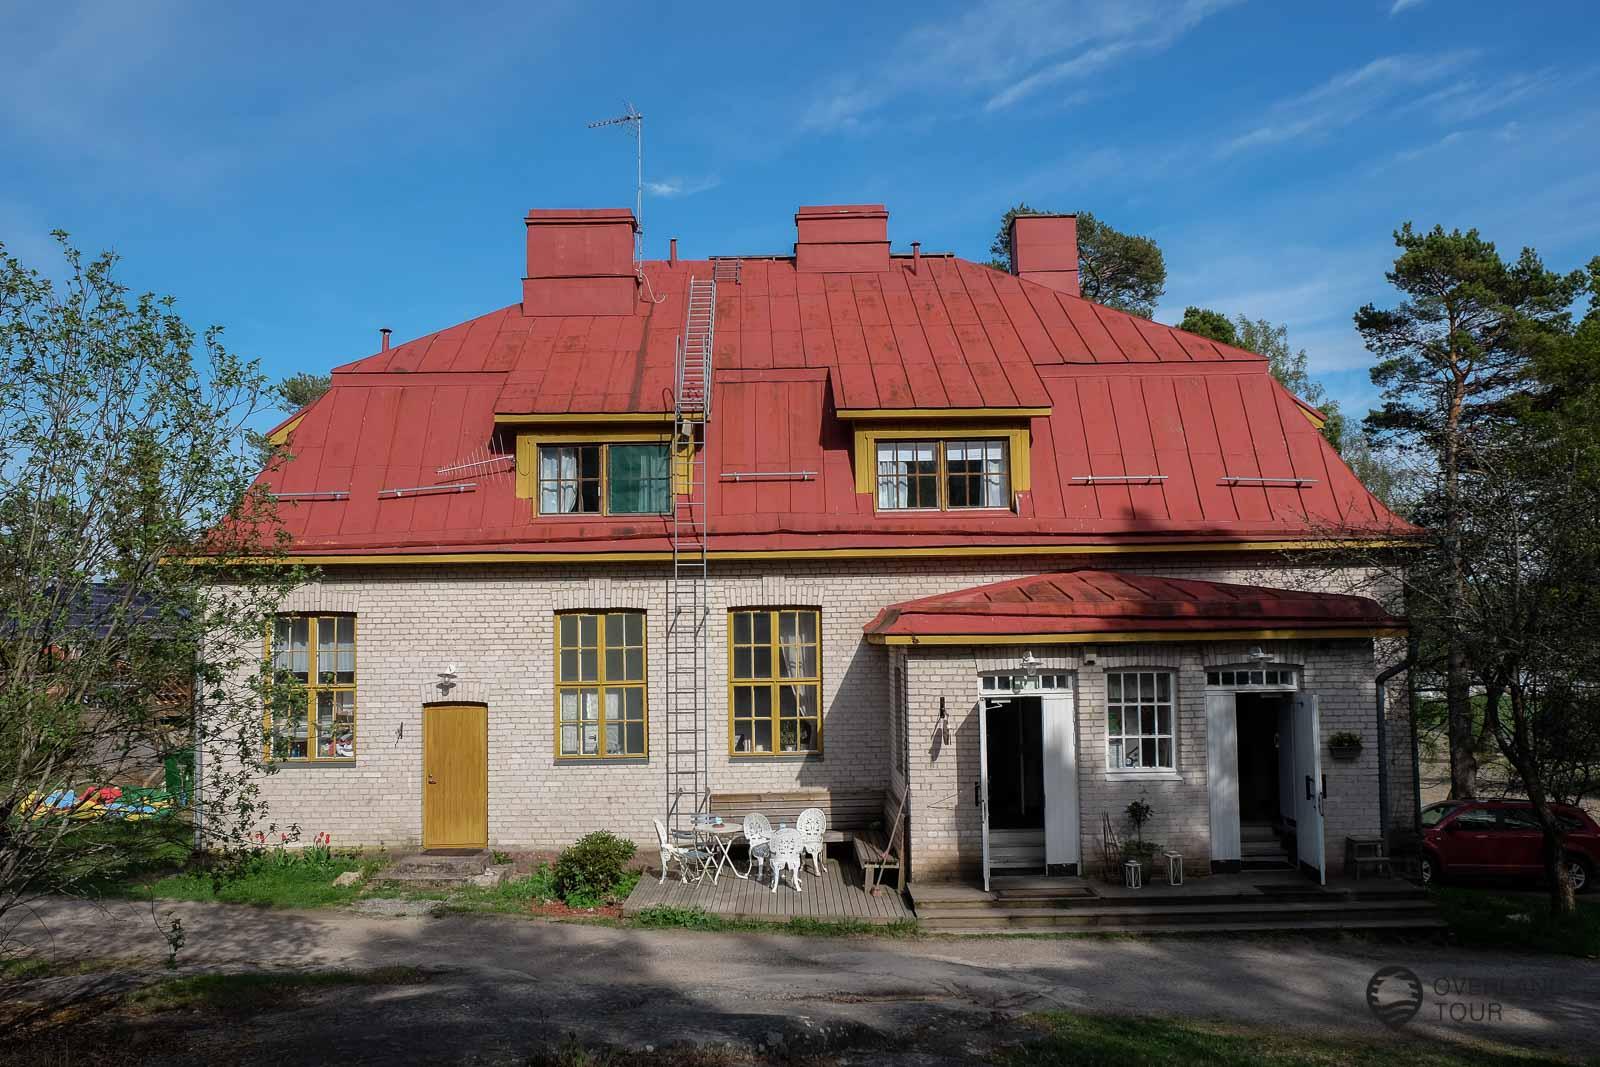 Das alte Schulhaus ist jetzt das B&B Kirjais Kursgård